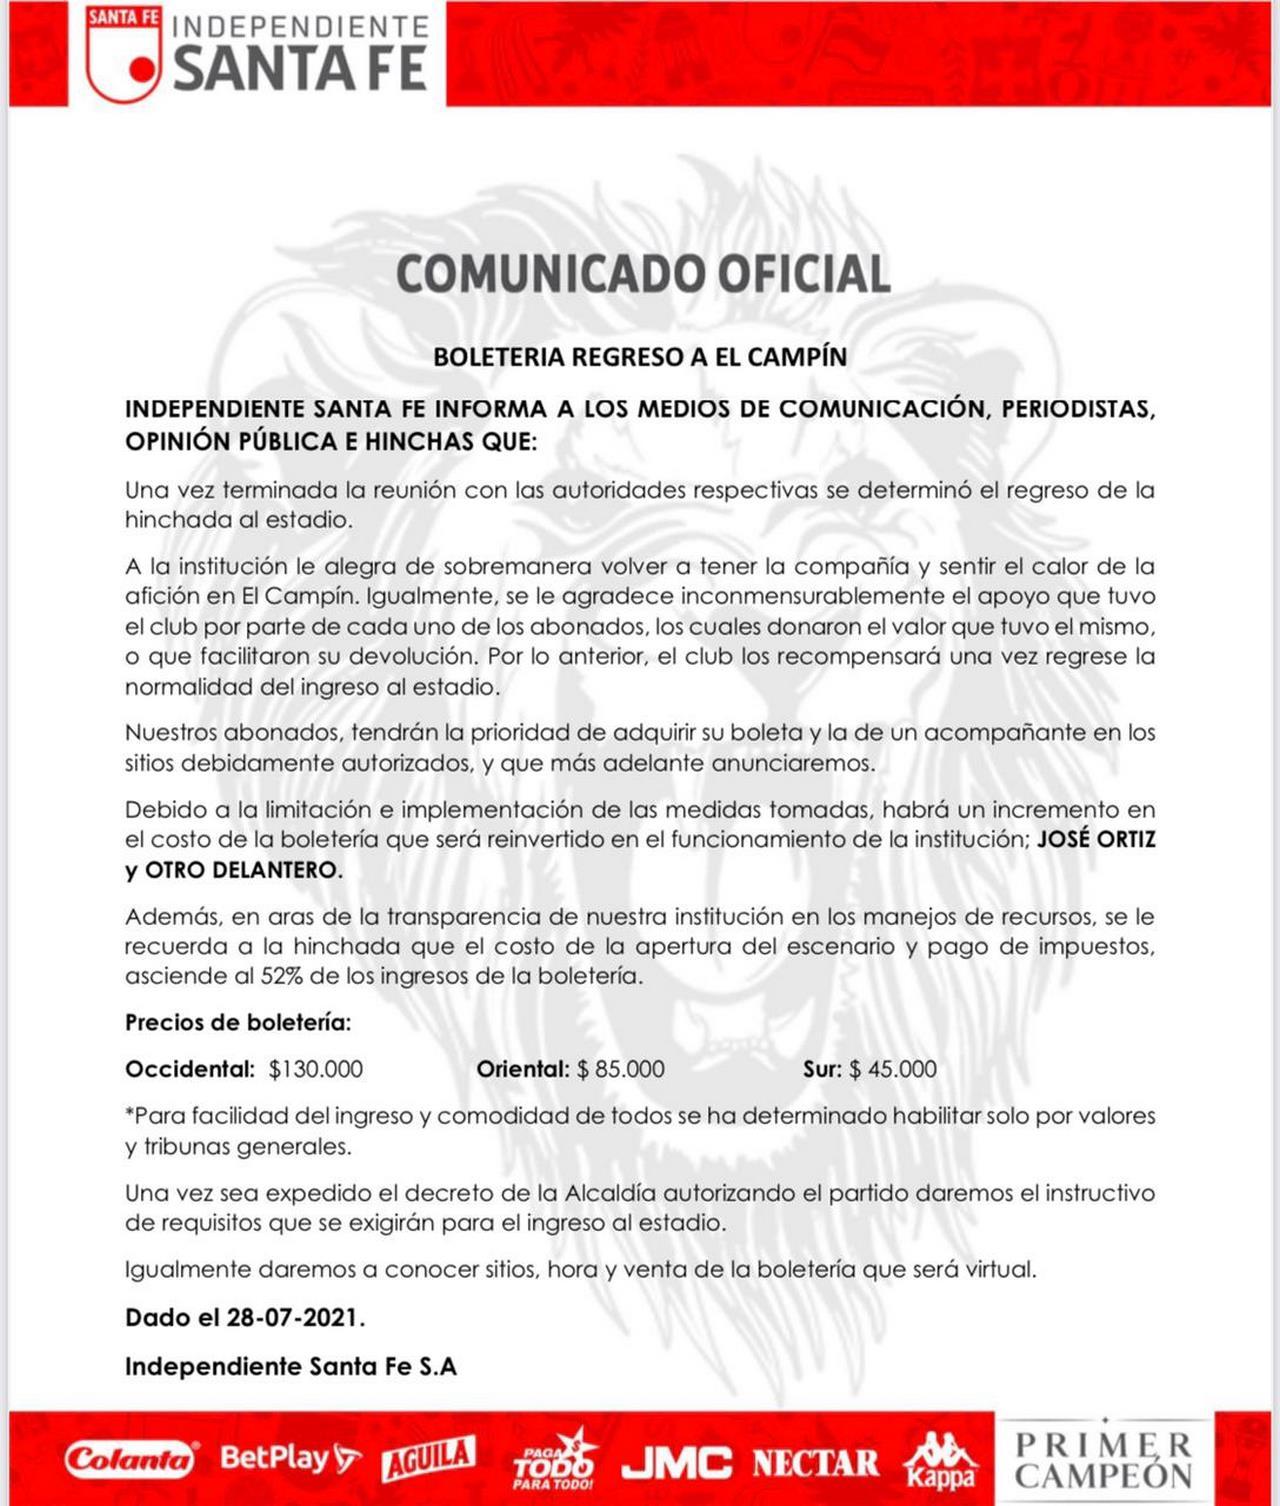 Comunicado de Independiente Santa Fe sobre boleteria